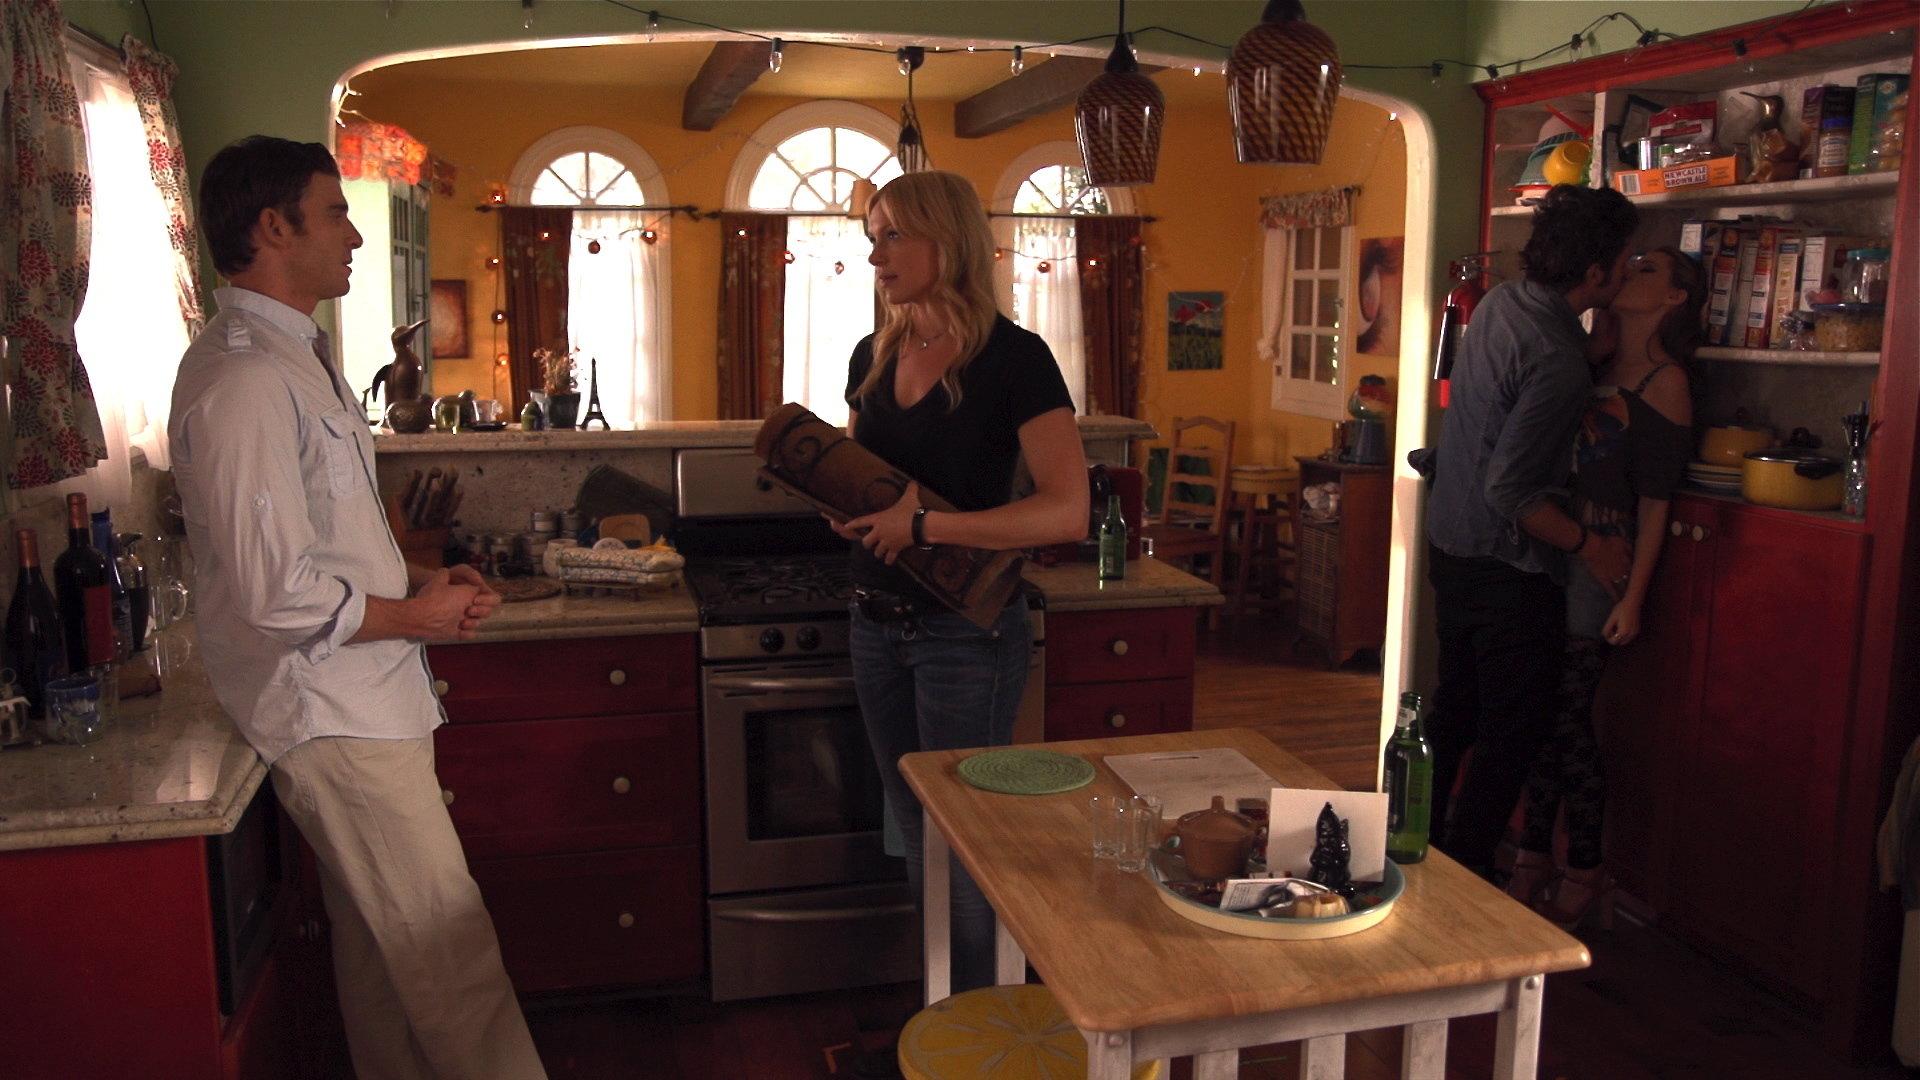 Laura Prepon and Bryan Greenberg in The Kitchen 2 - HeyUGuys